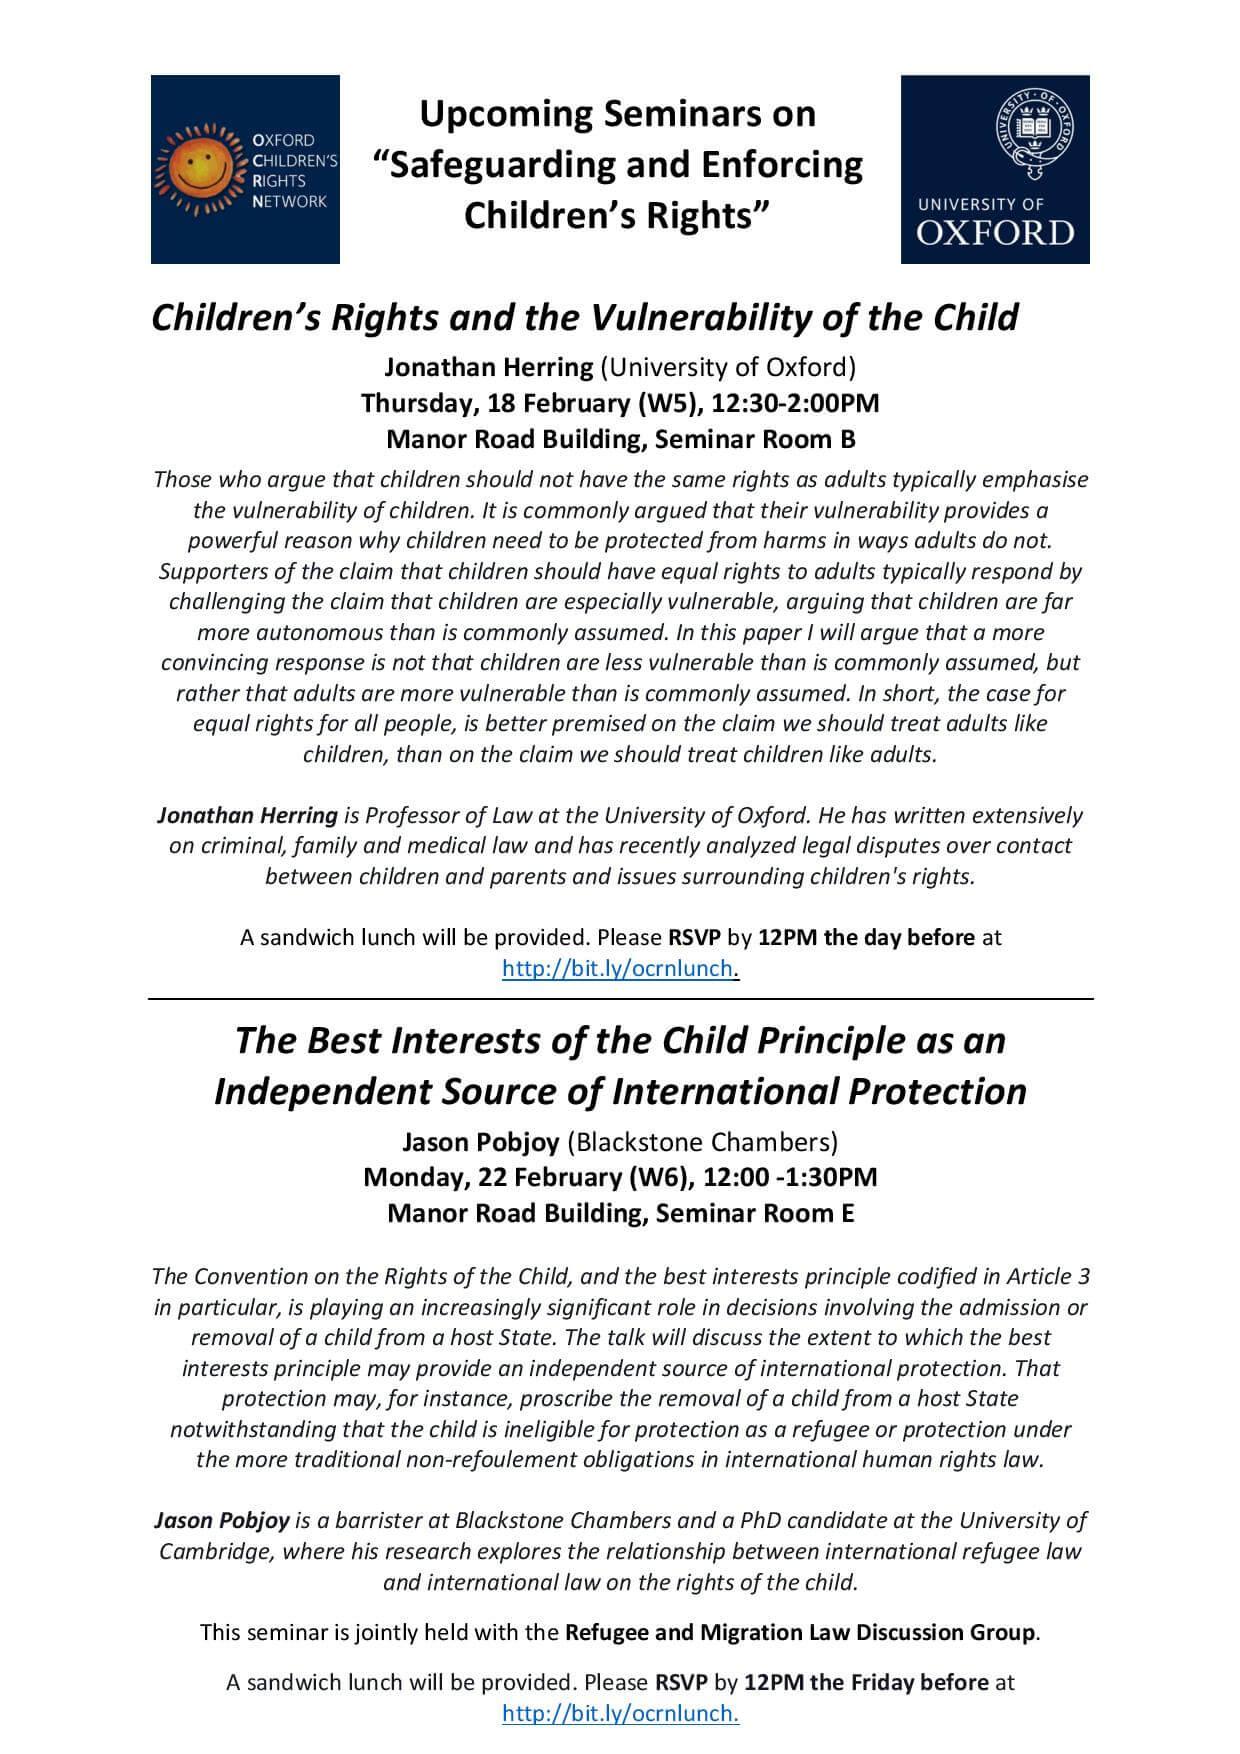 Oxford Children's Rights Network: Upcoming Seminars